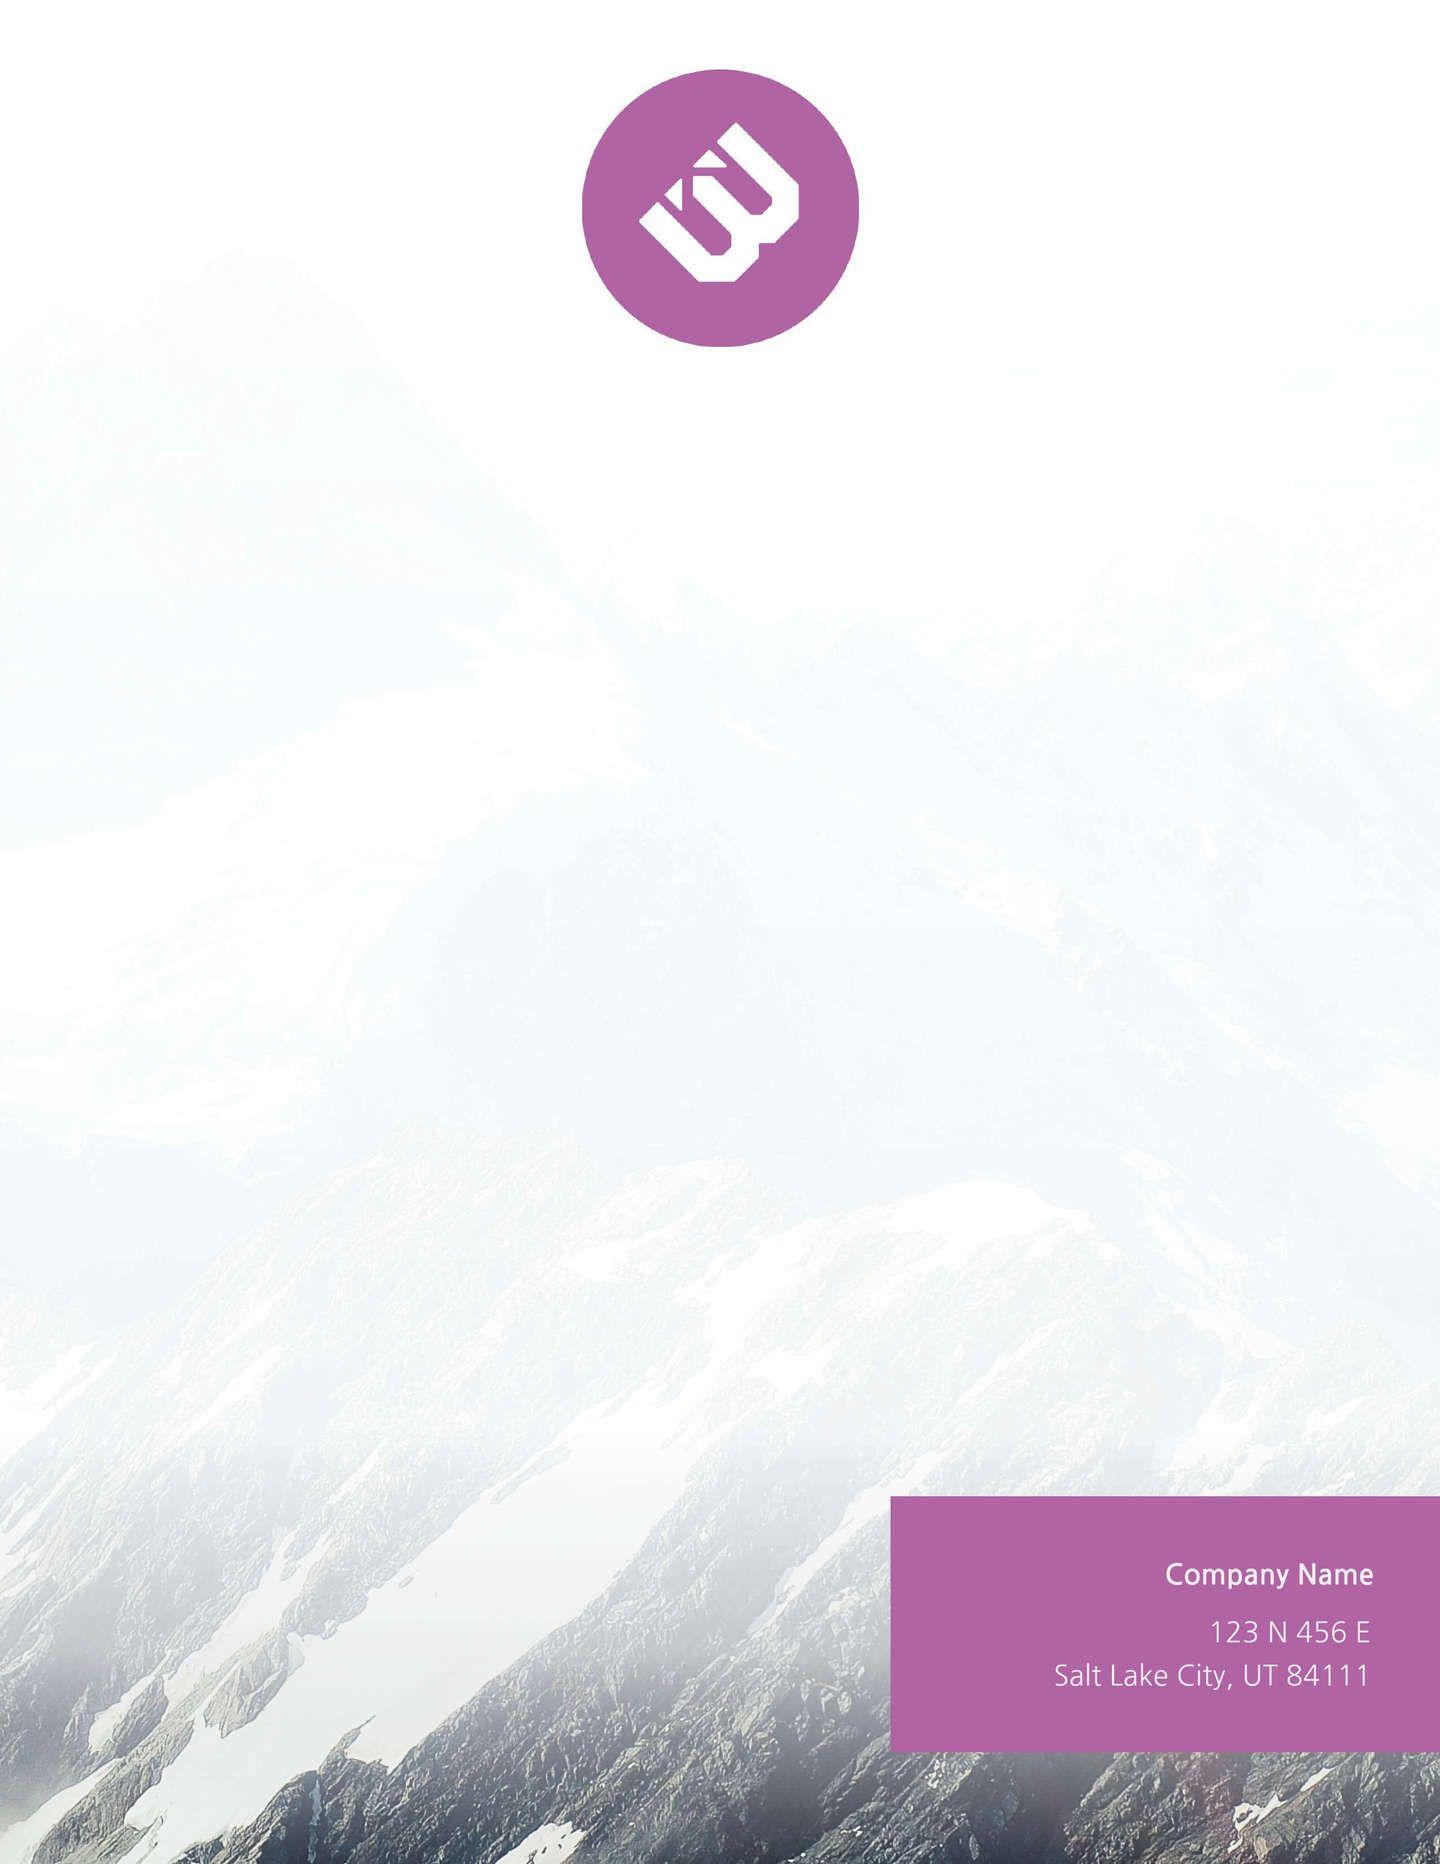 letterhead maker design letterheads online [7 free example mail for sending resume cv format pdf students template customer service representative